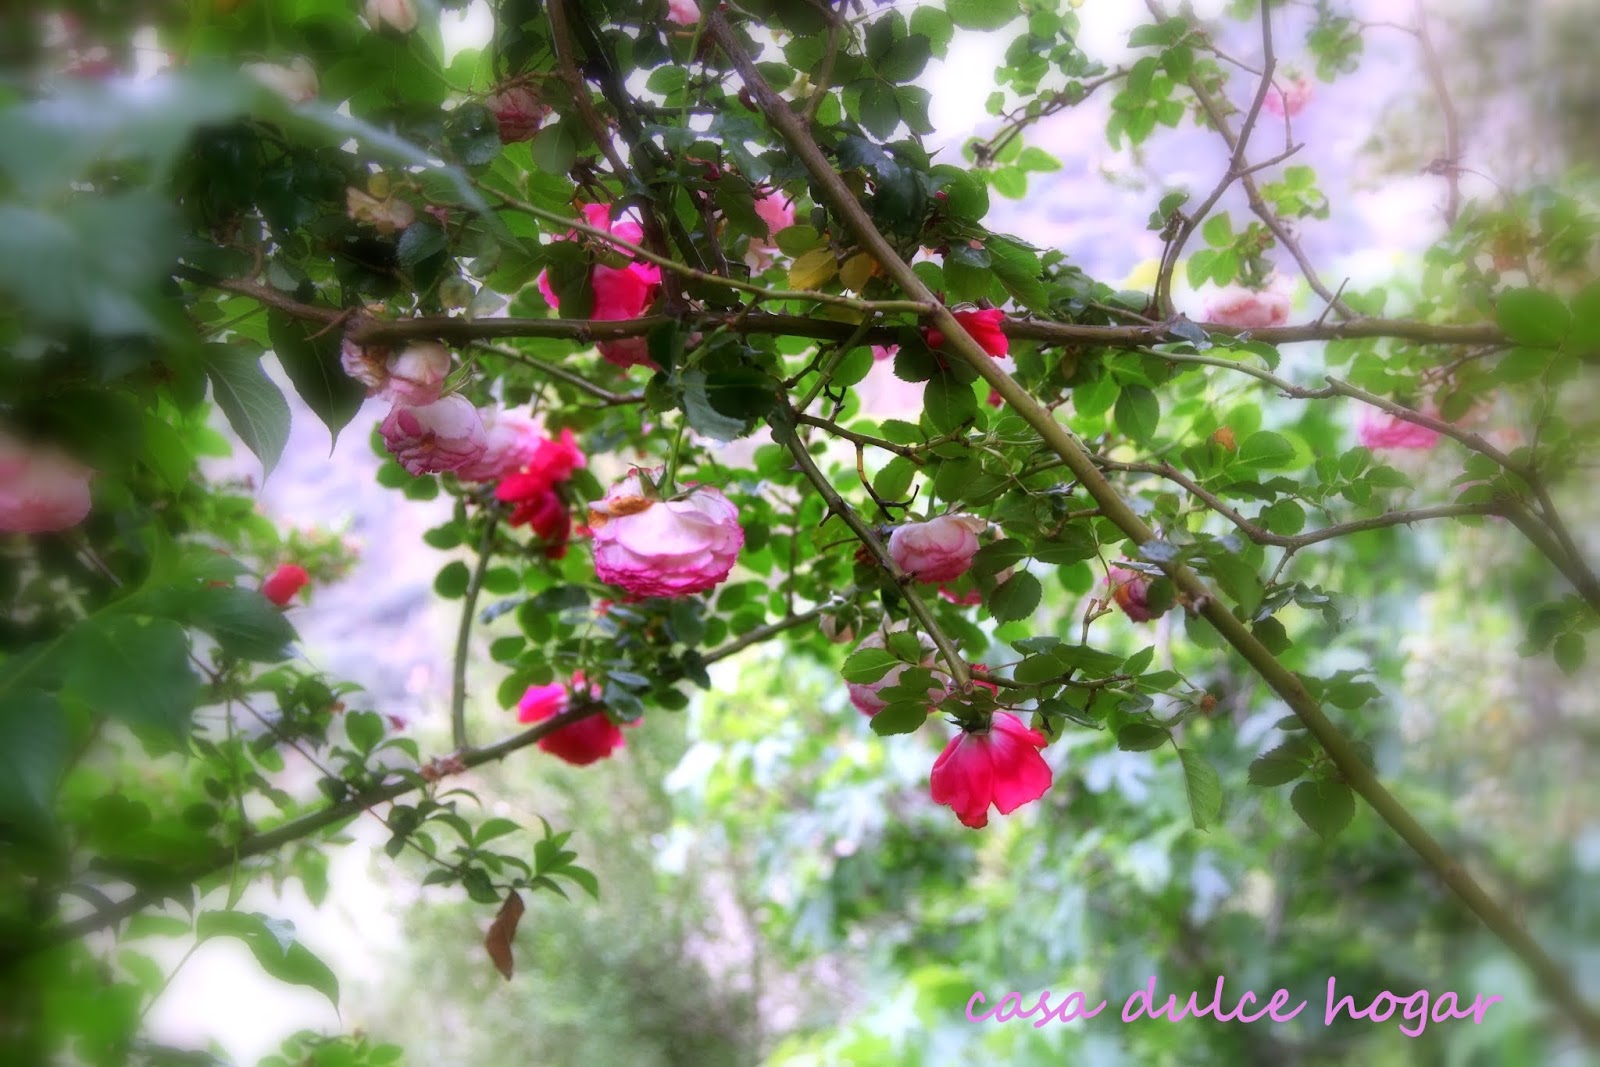 Casa dulce hogar rosas de mi jard n en mi altar for Ahuyentar gatos de mi jardin